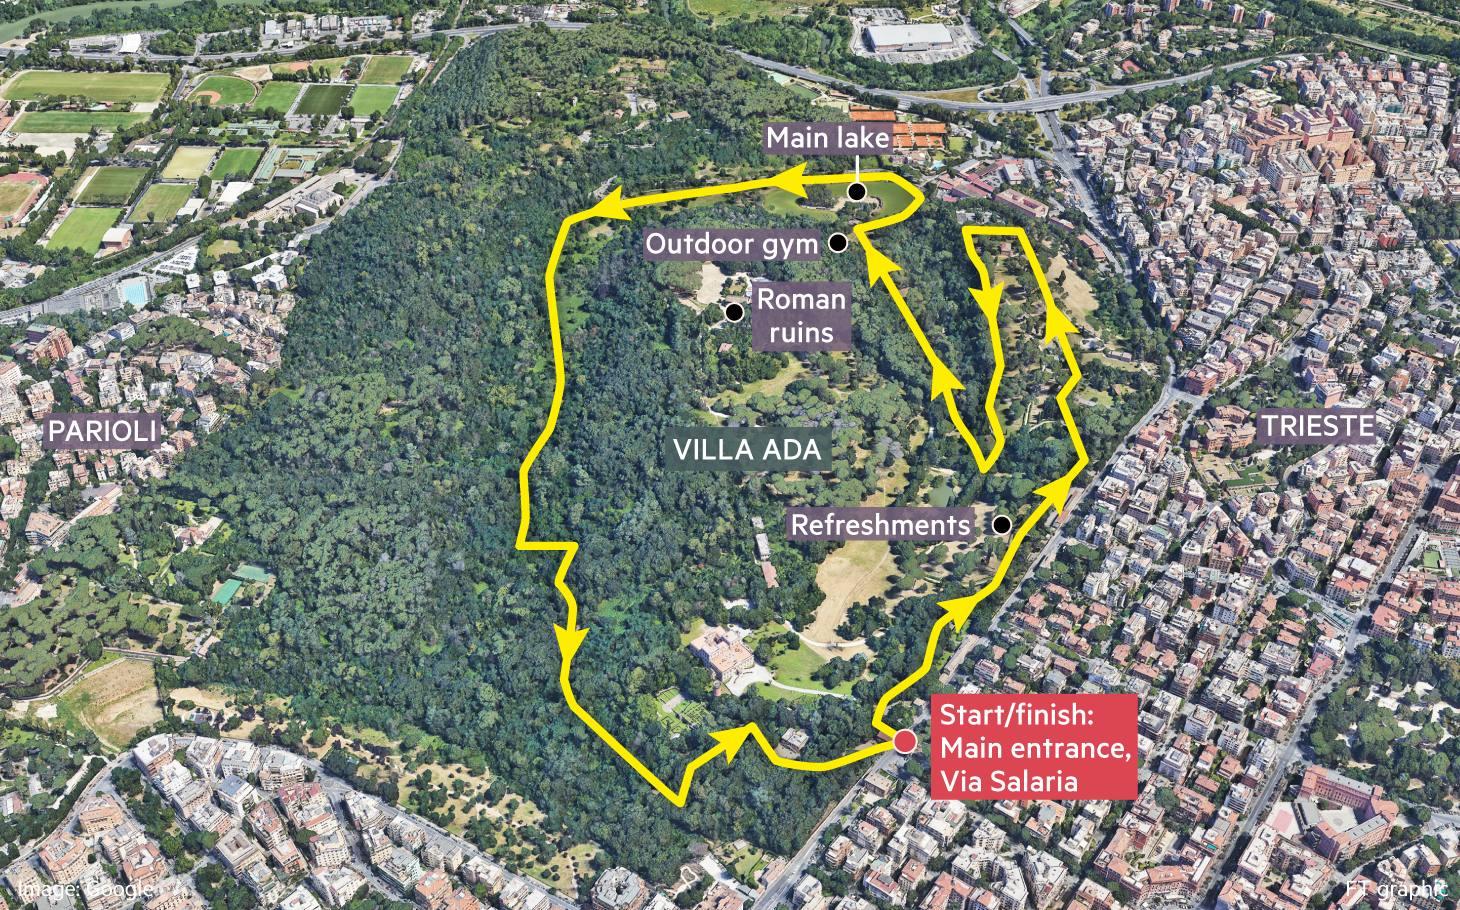 Globetrotter running map of Villa Ada in Rome